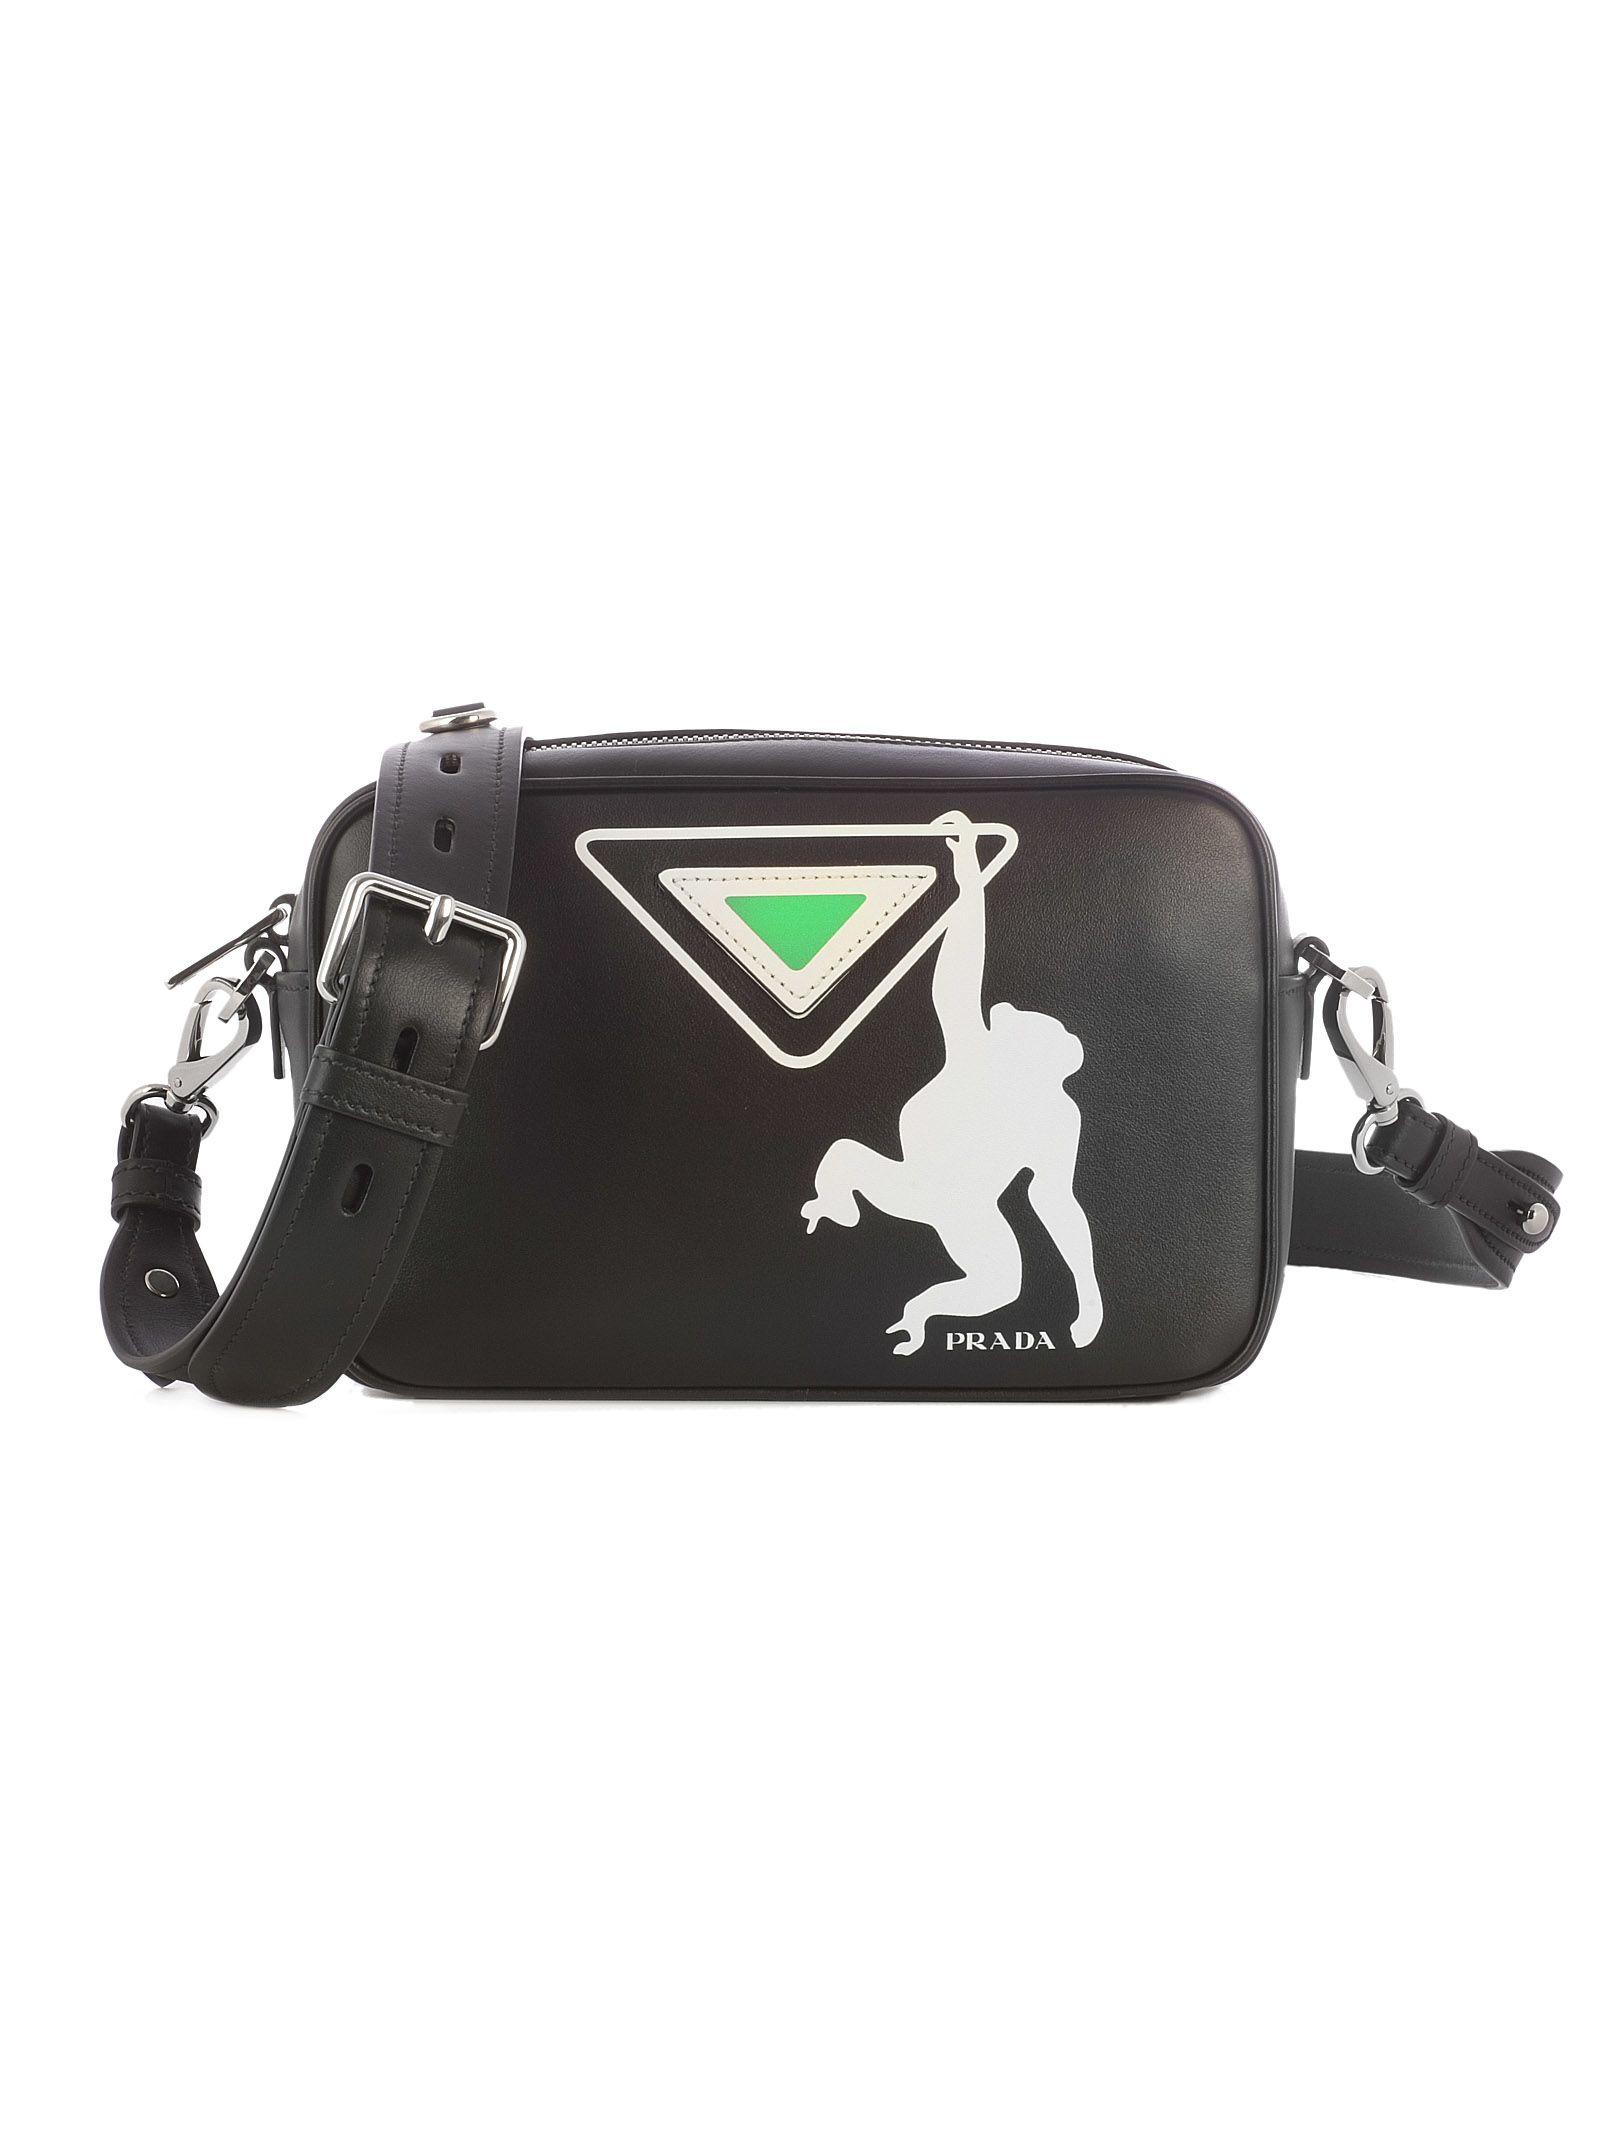 Prada Monkey Print Camera Shoulder Bag